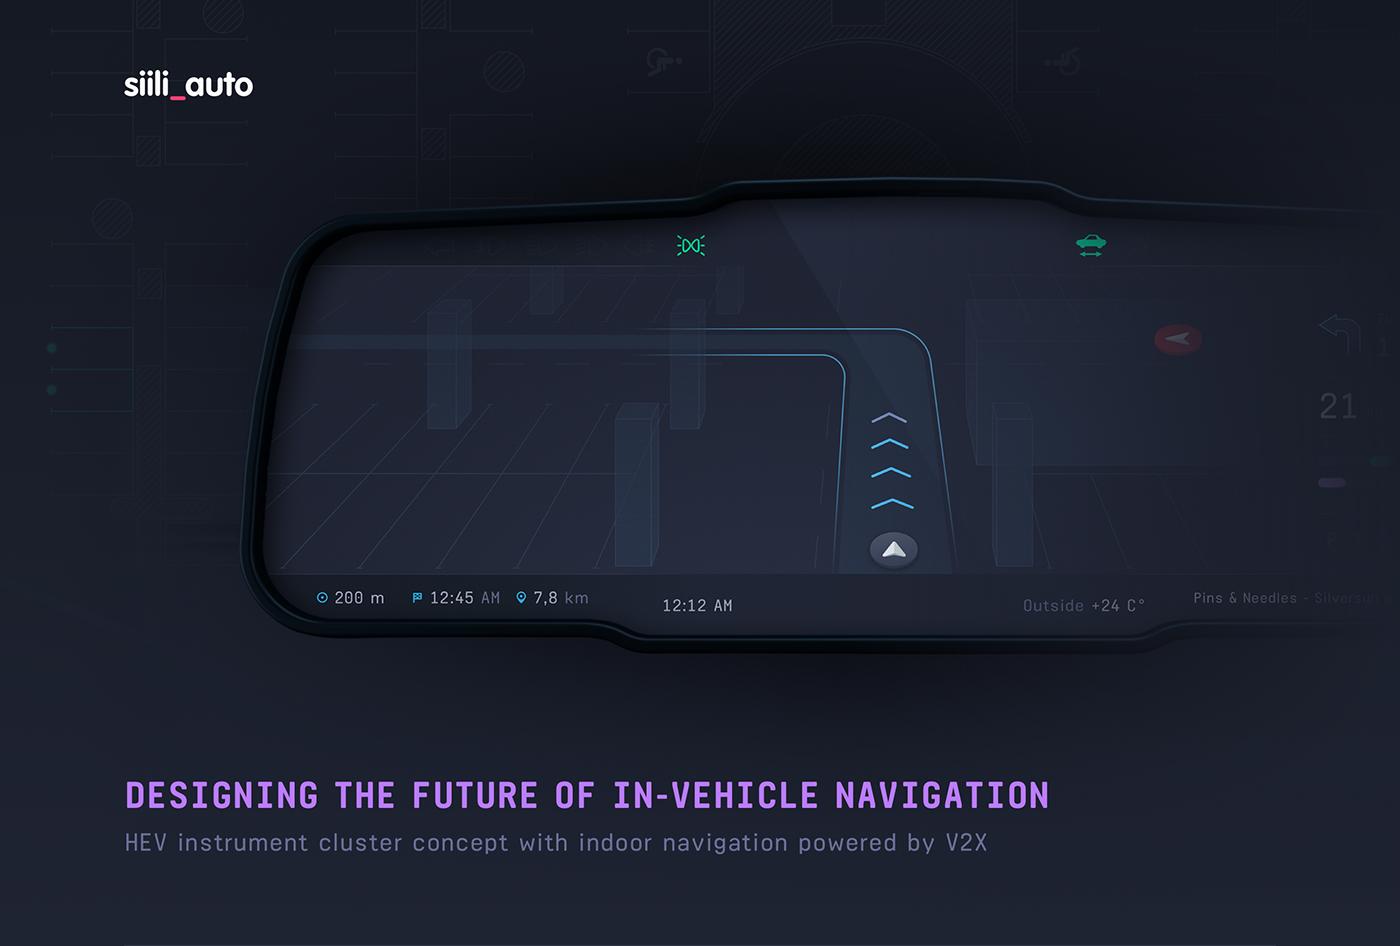 instrument cluster  siili auto siili Automotive design automotive   UI ux hmi